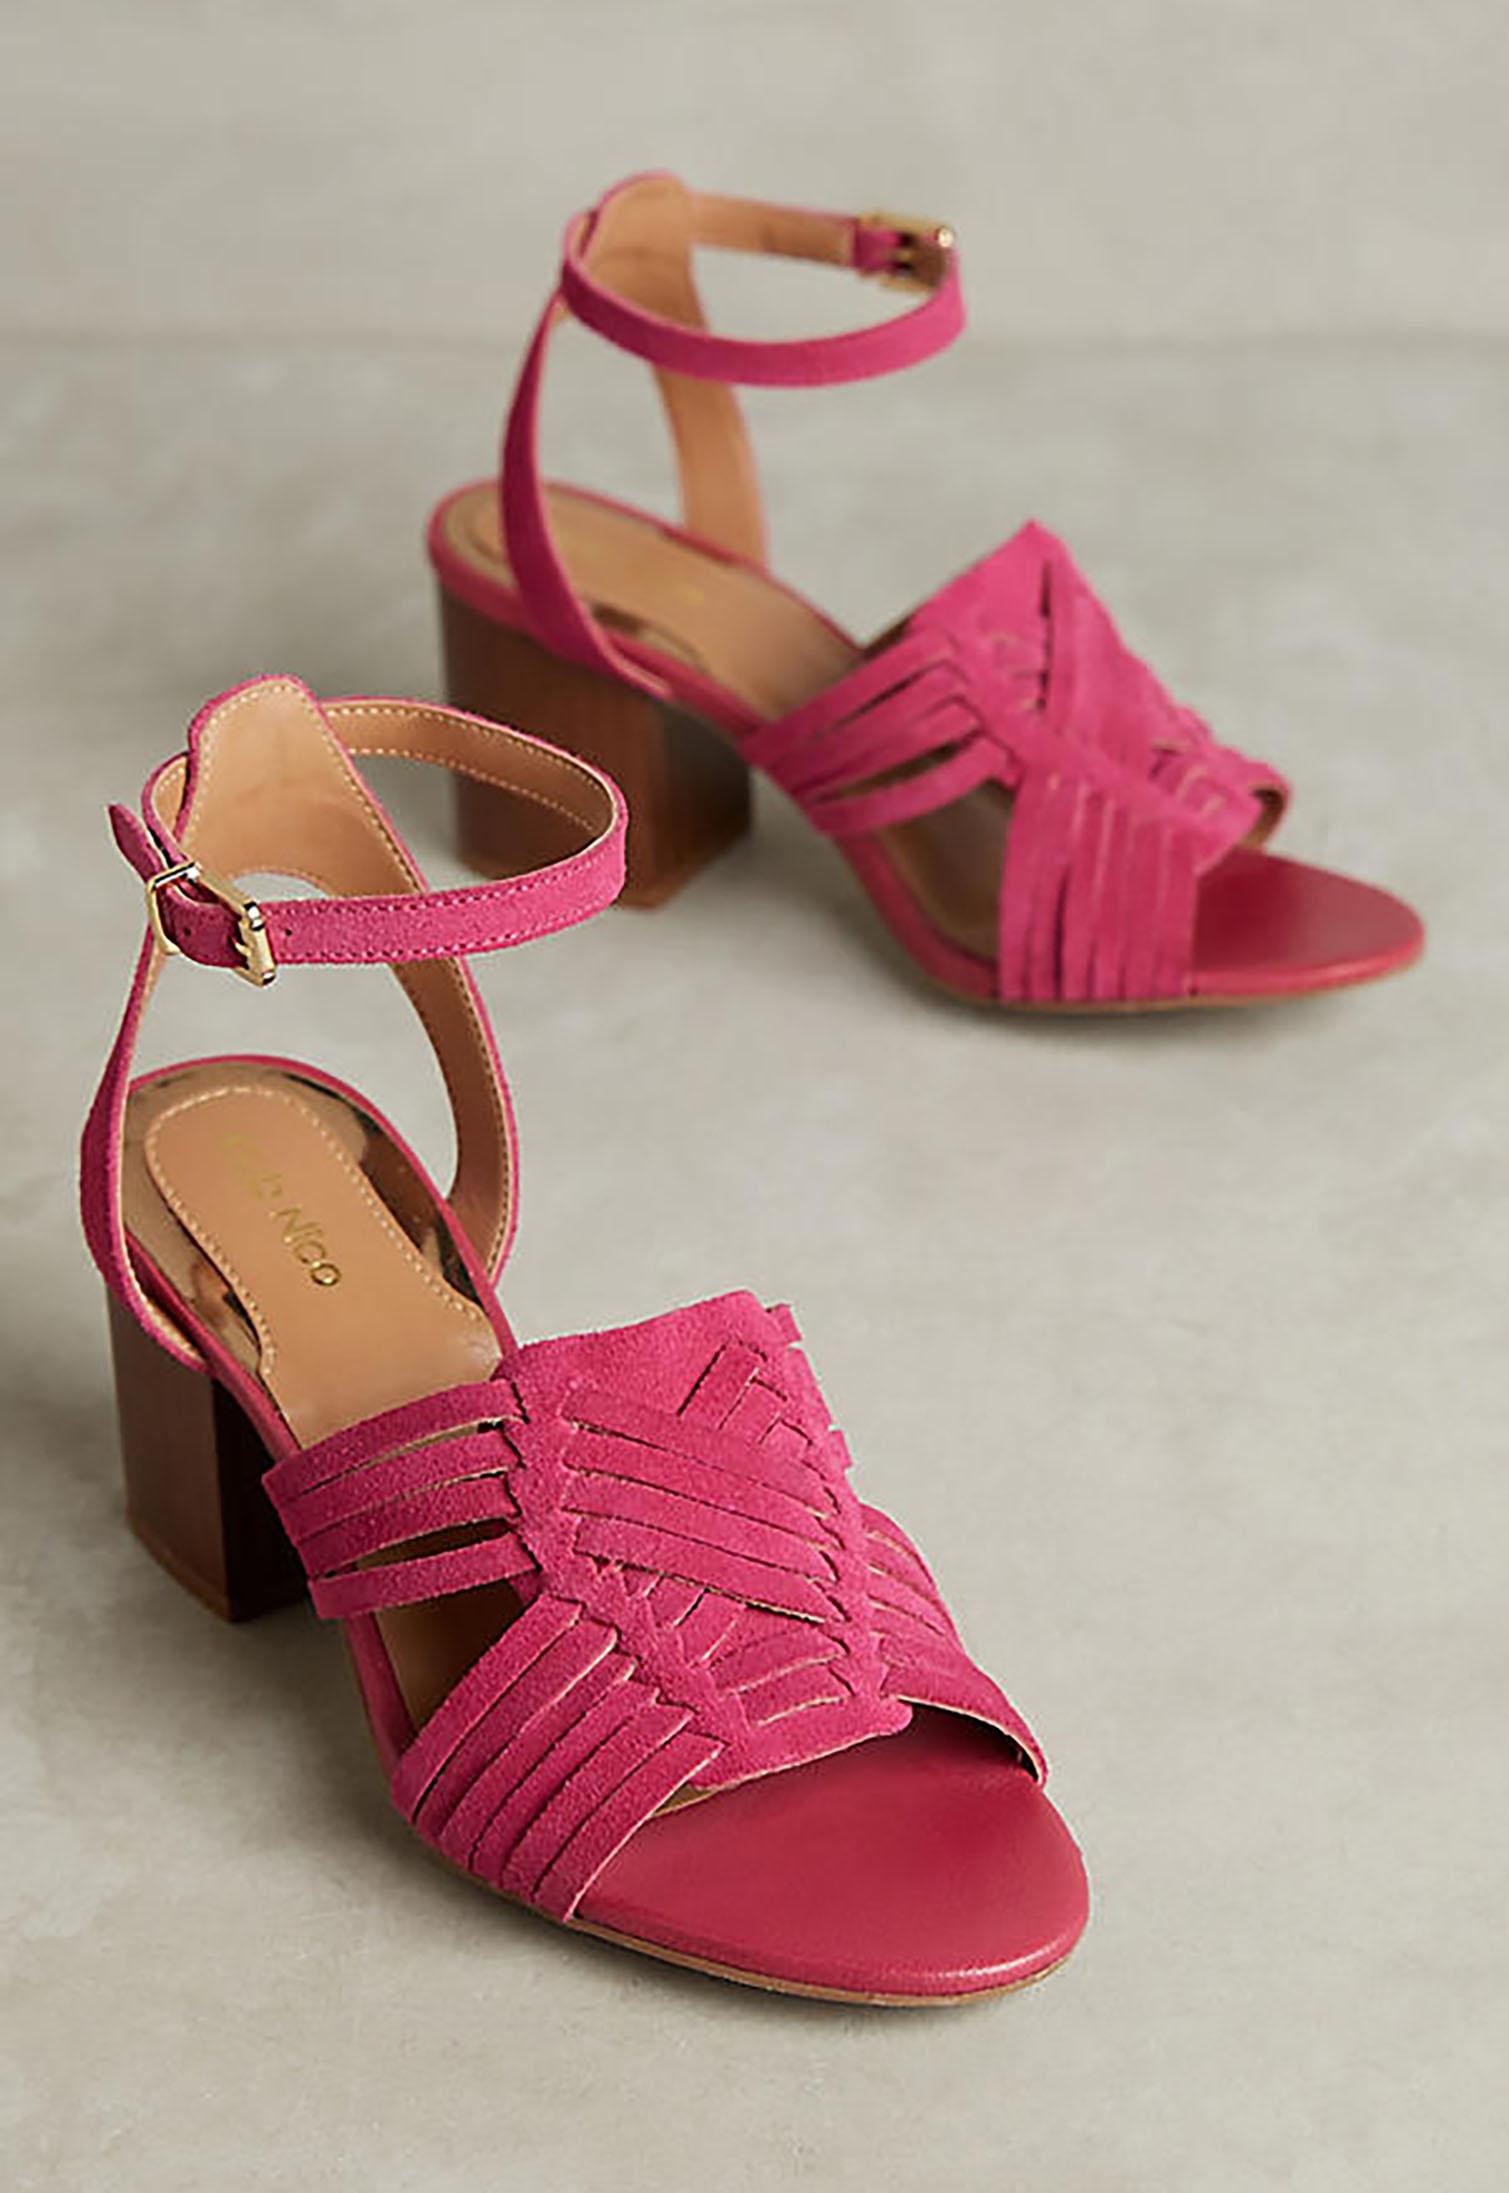 Woven Suede Heels | Green Wedding Shoes